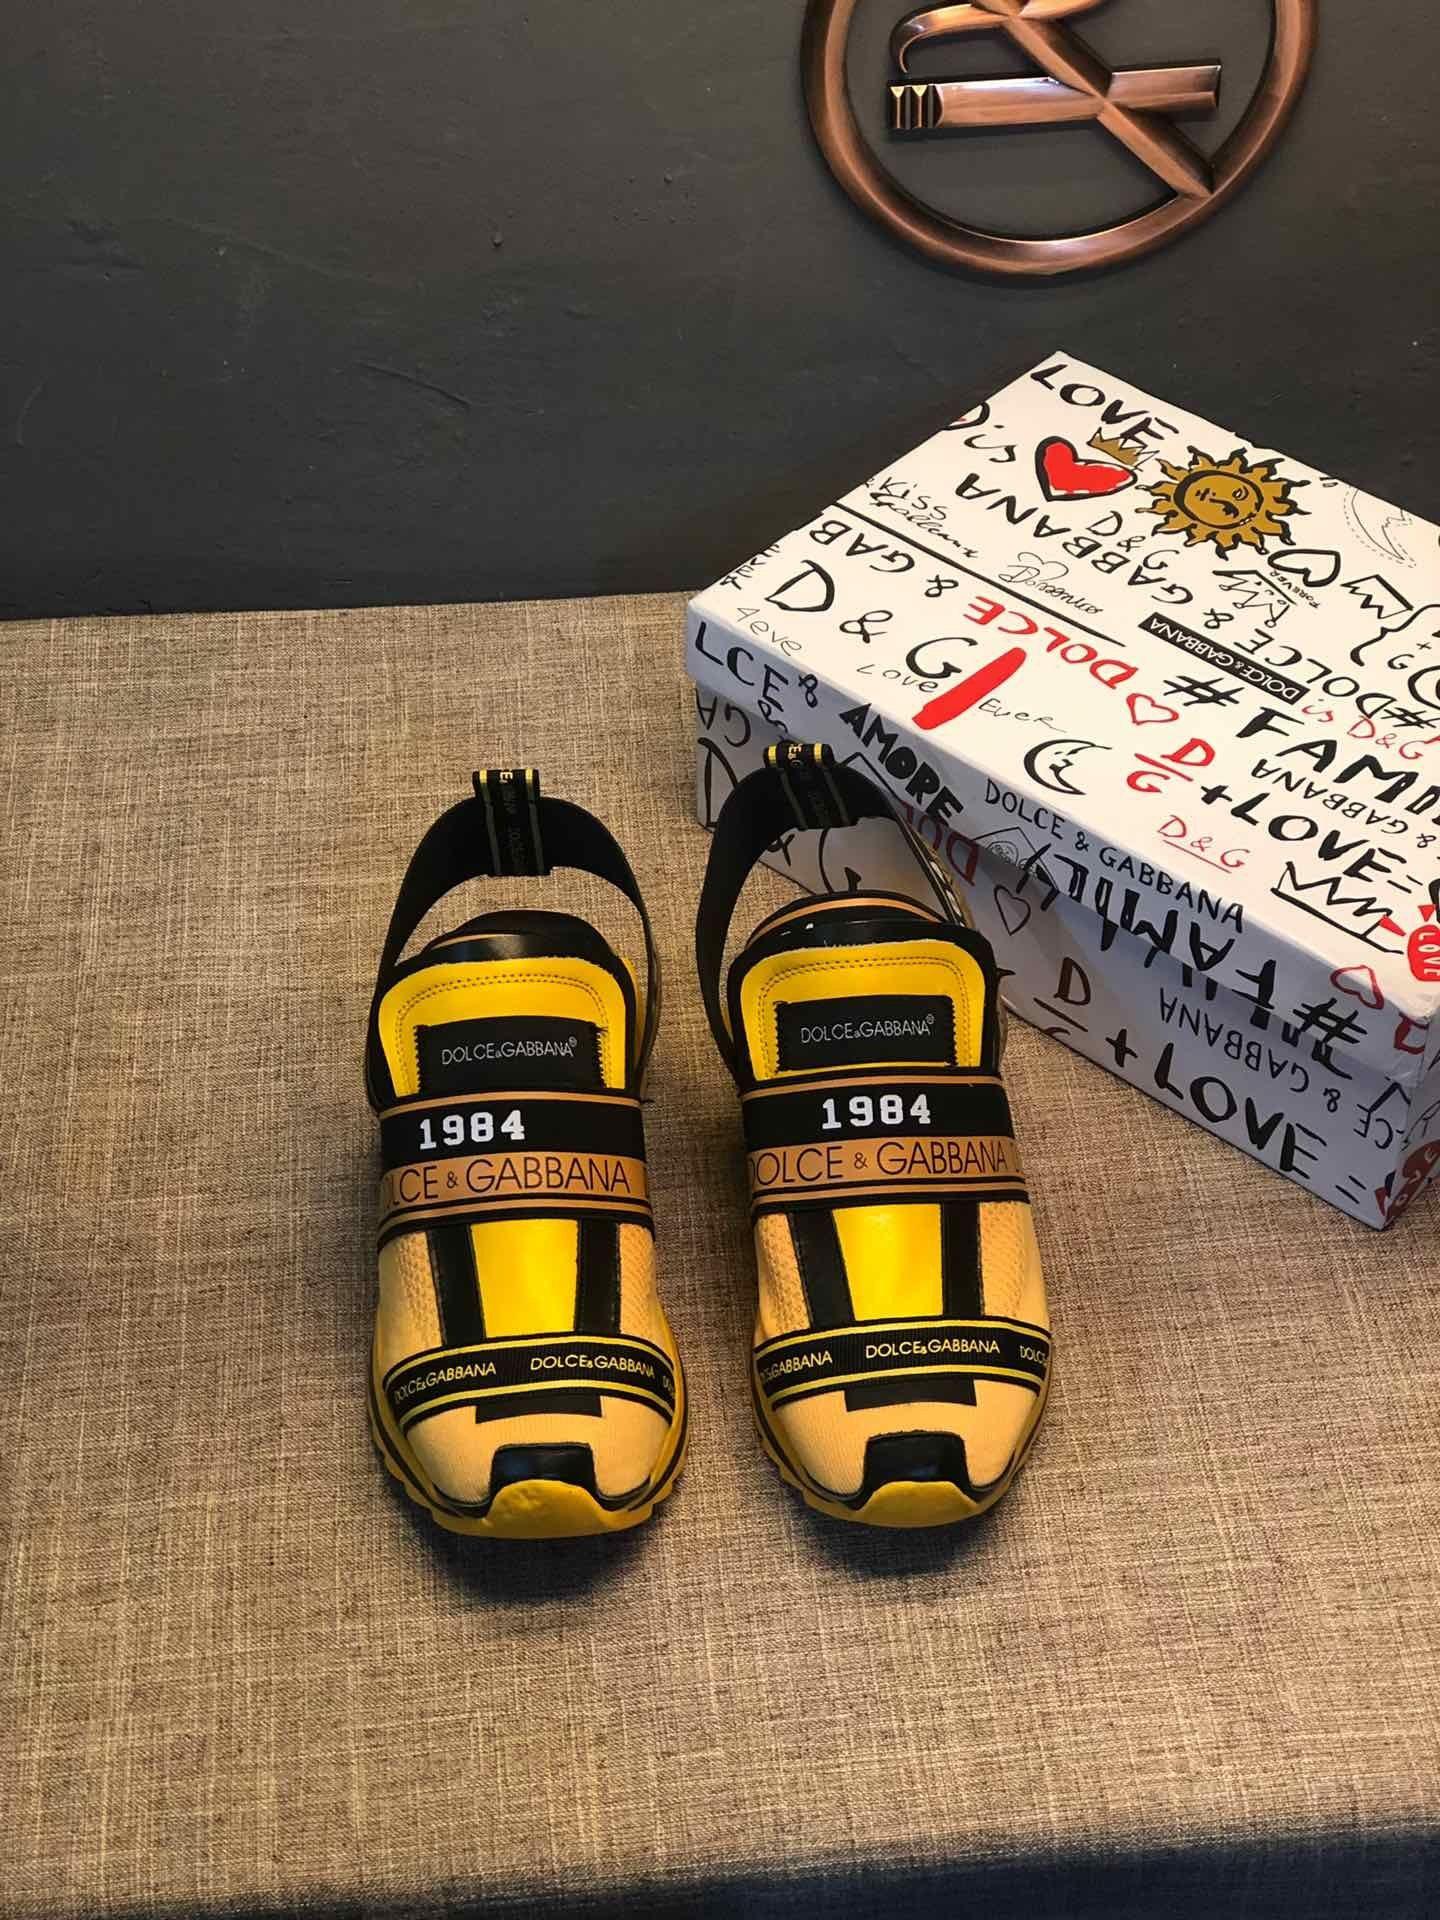 2020 da scarpe uomo di Design de luxe yellwo luxe noir bottillons en tricot extensible marques de formateurs de la plate-forme de CALCADOS # 2F